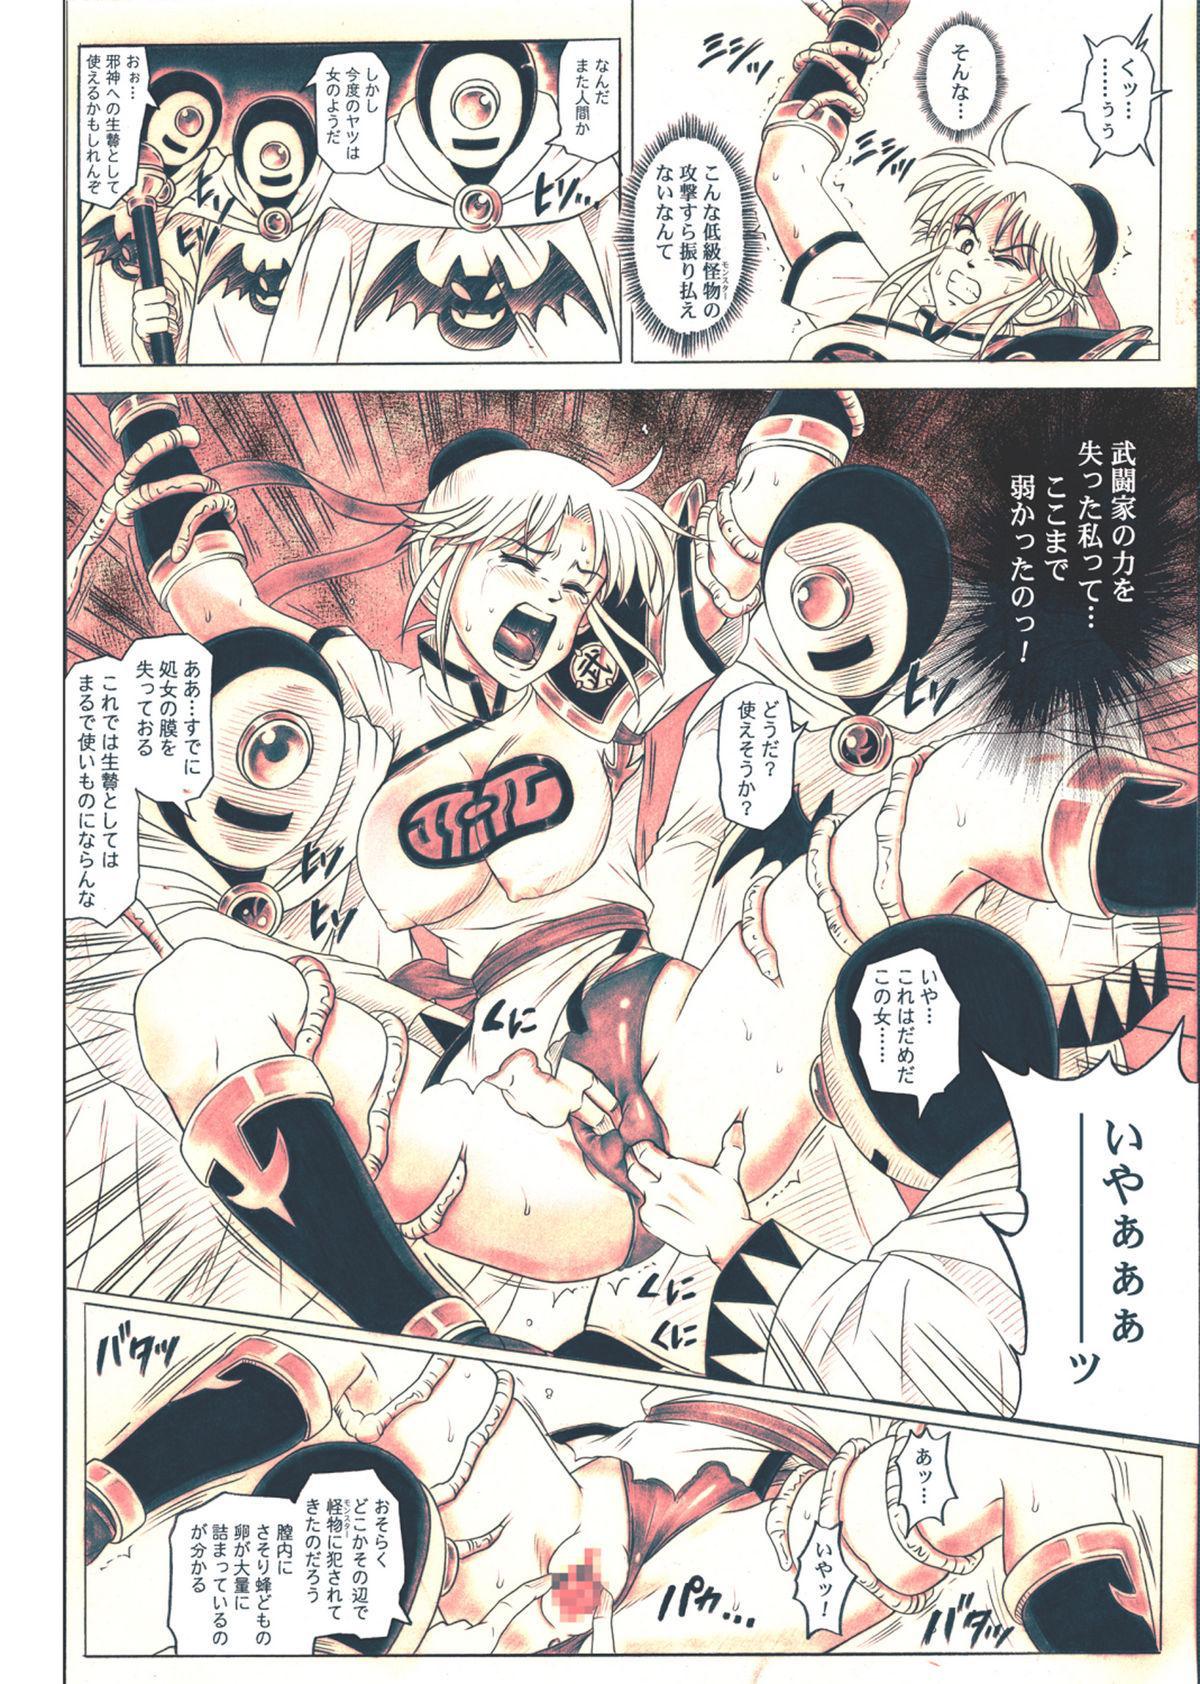 [Cyclone (Reizei, Izumi)] STAR TAC IDO ~Youkuso Haja no Doukutsu he~ Chuuhen Download edition (Dragon Warrior: Dai's Great Adventure) [Digital] 99